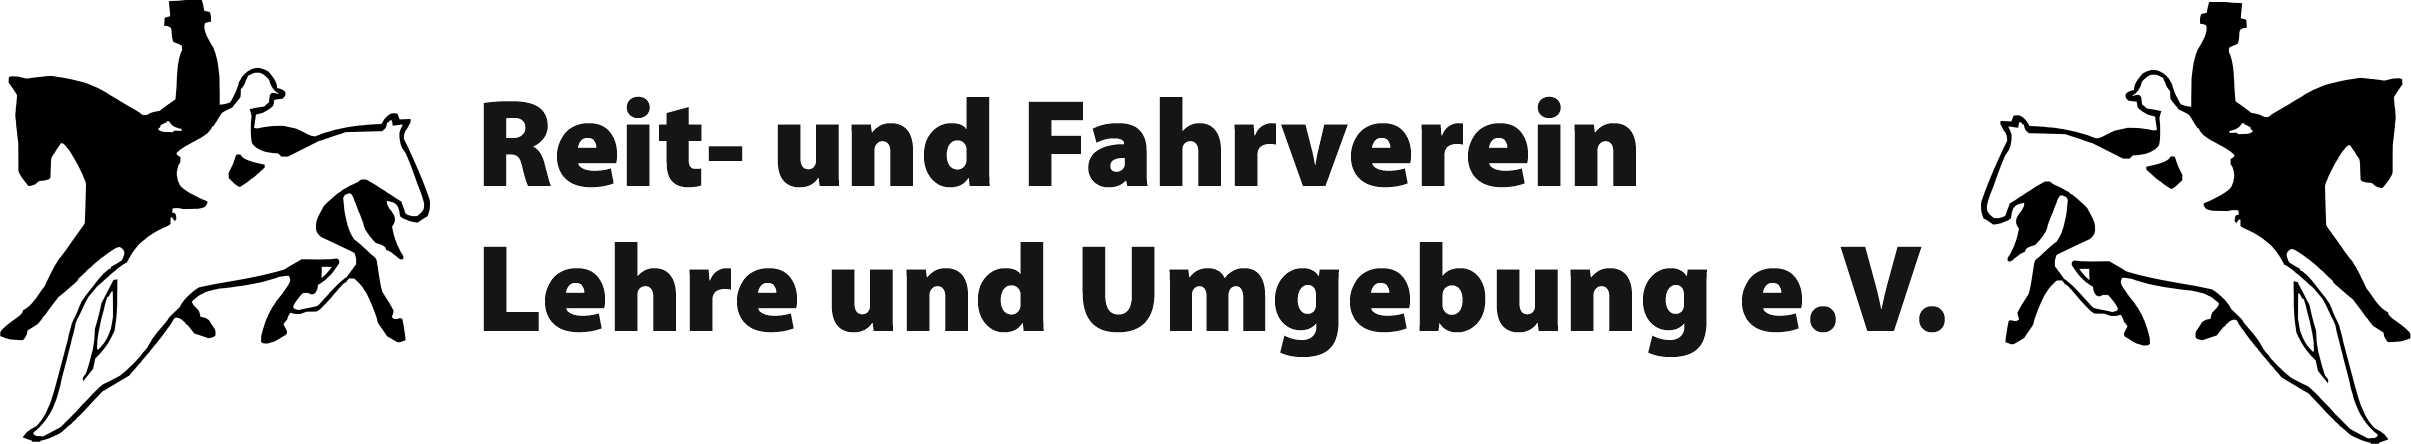 Reit- und Fahrverein Lehre e.V.